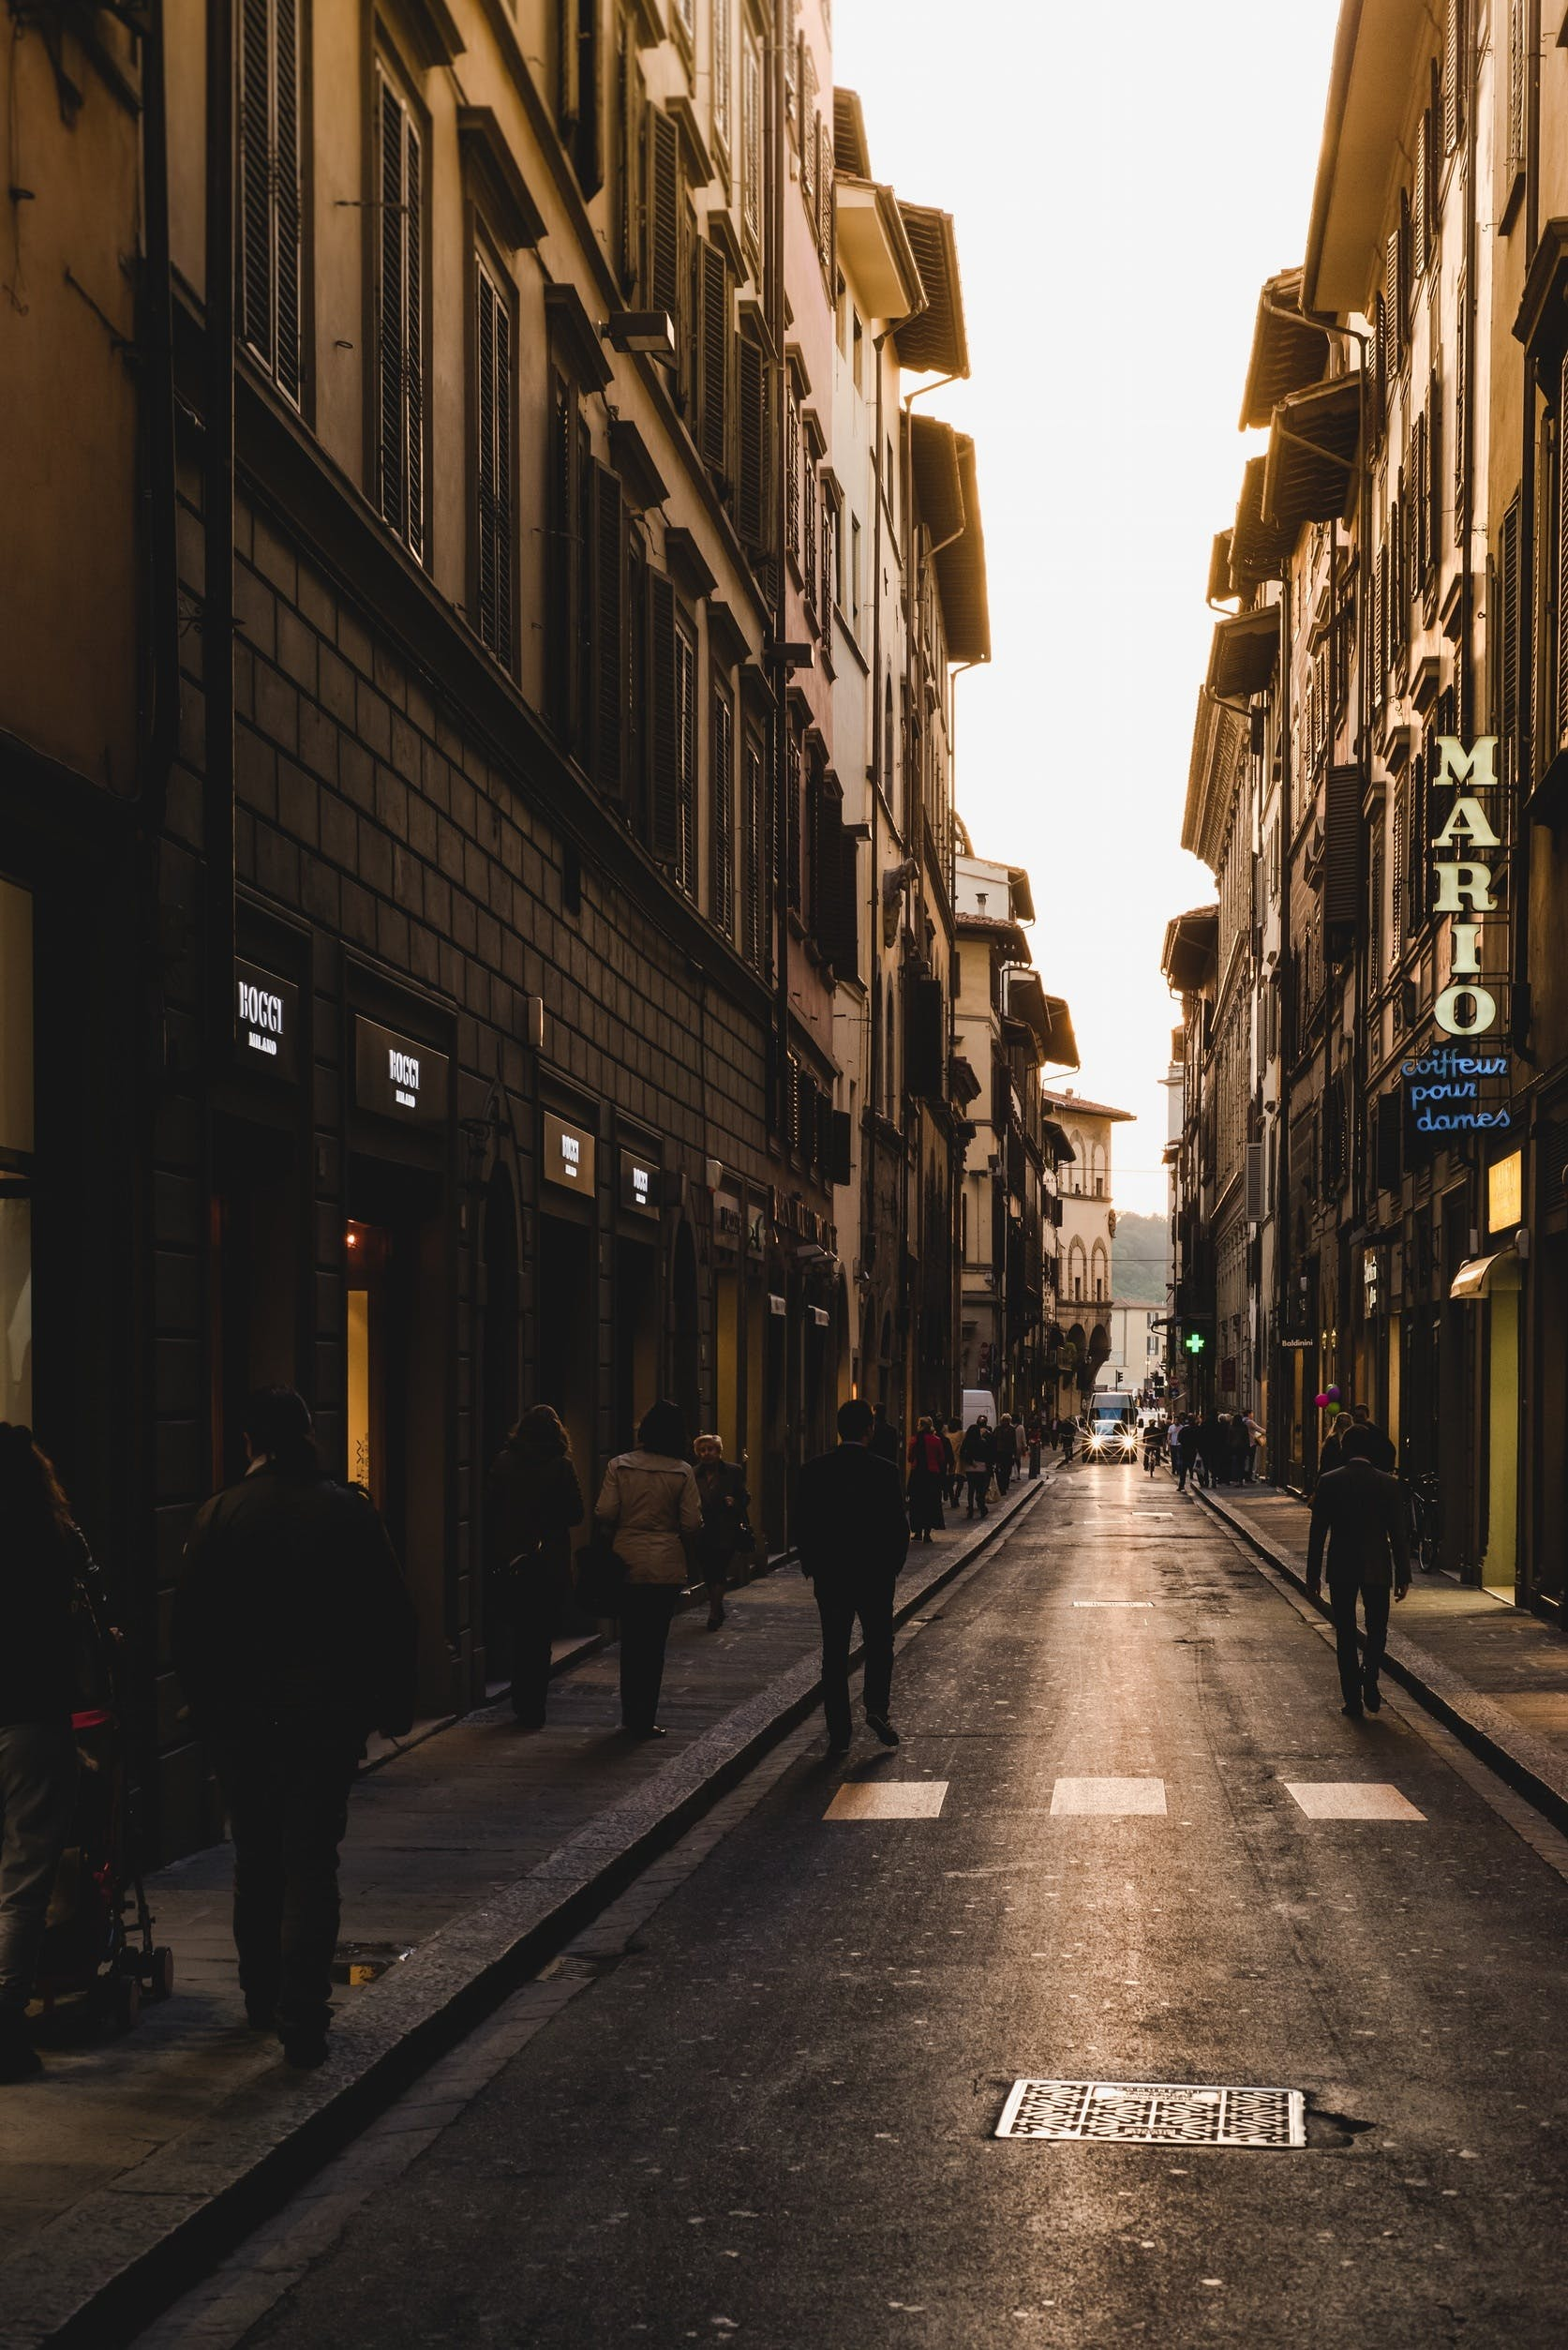 Person Walking on Street during Daytime